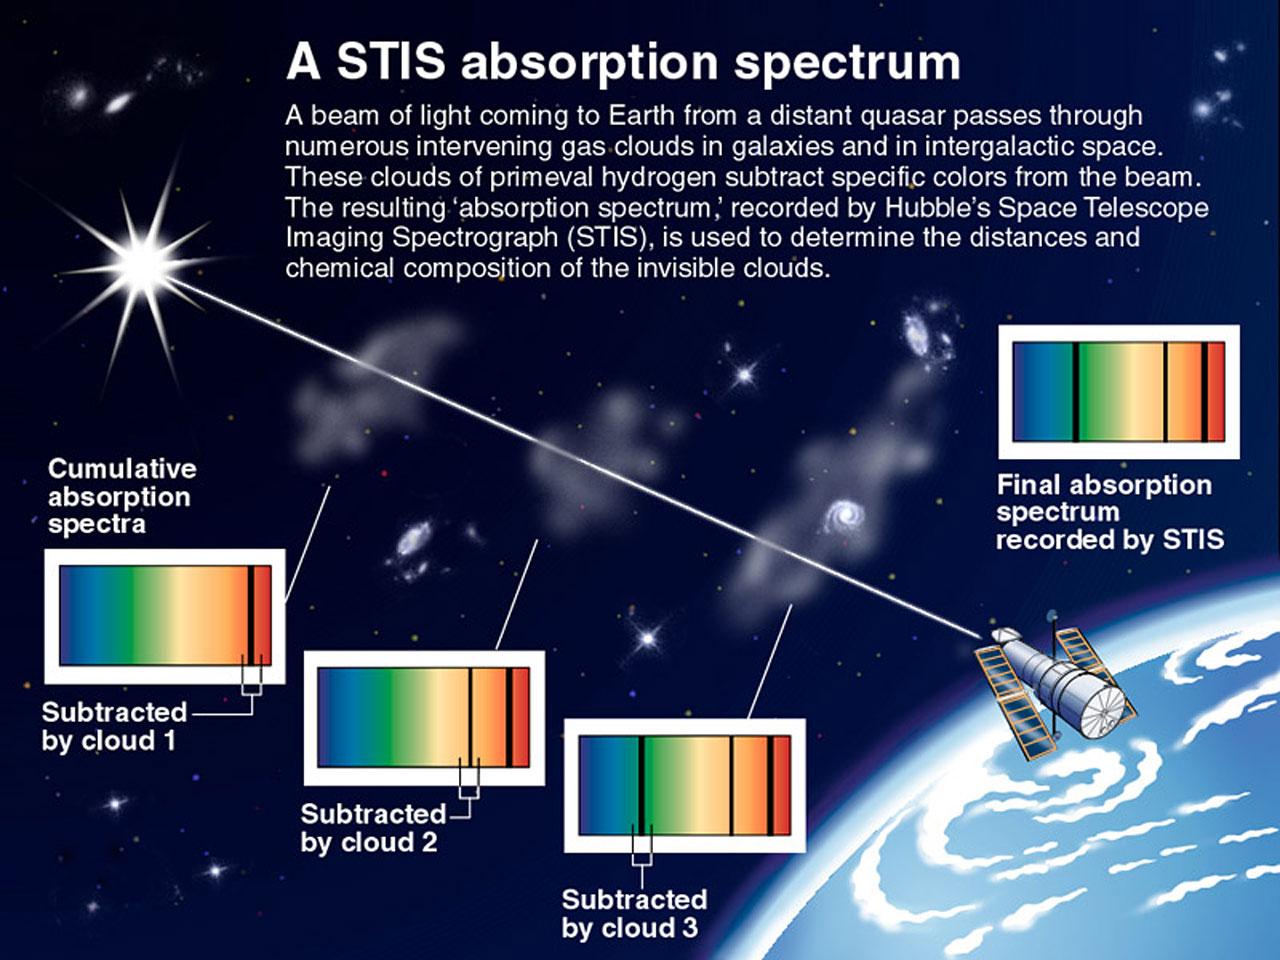 A STIS Absorption Spectrum